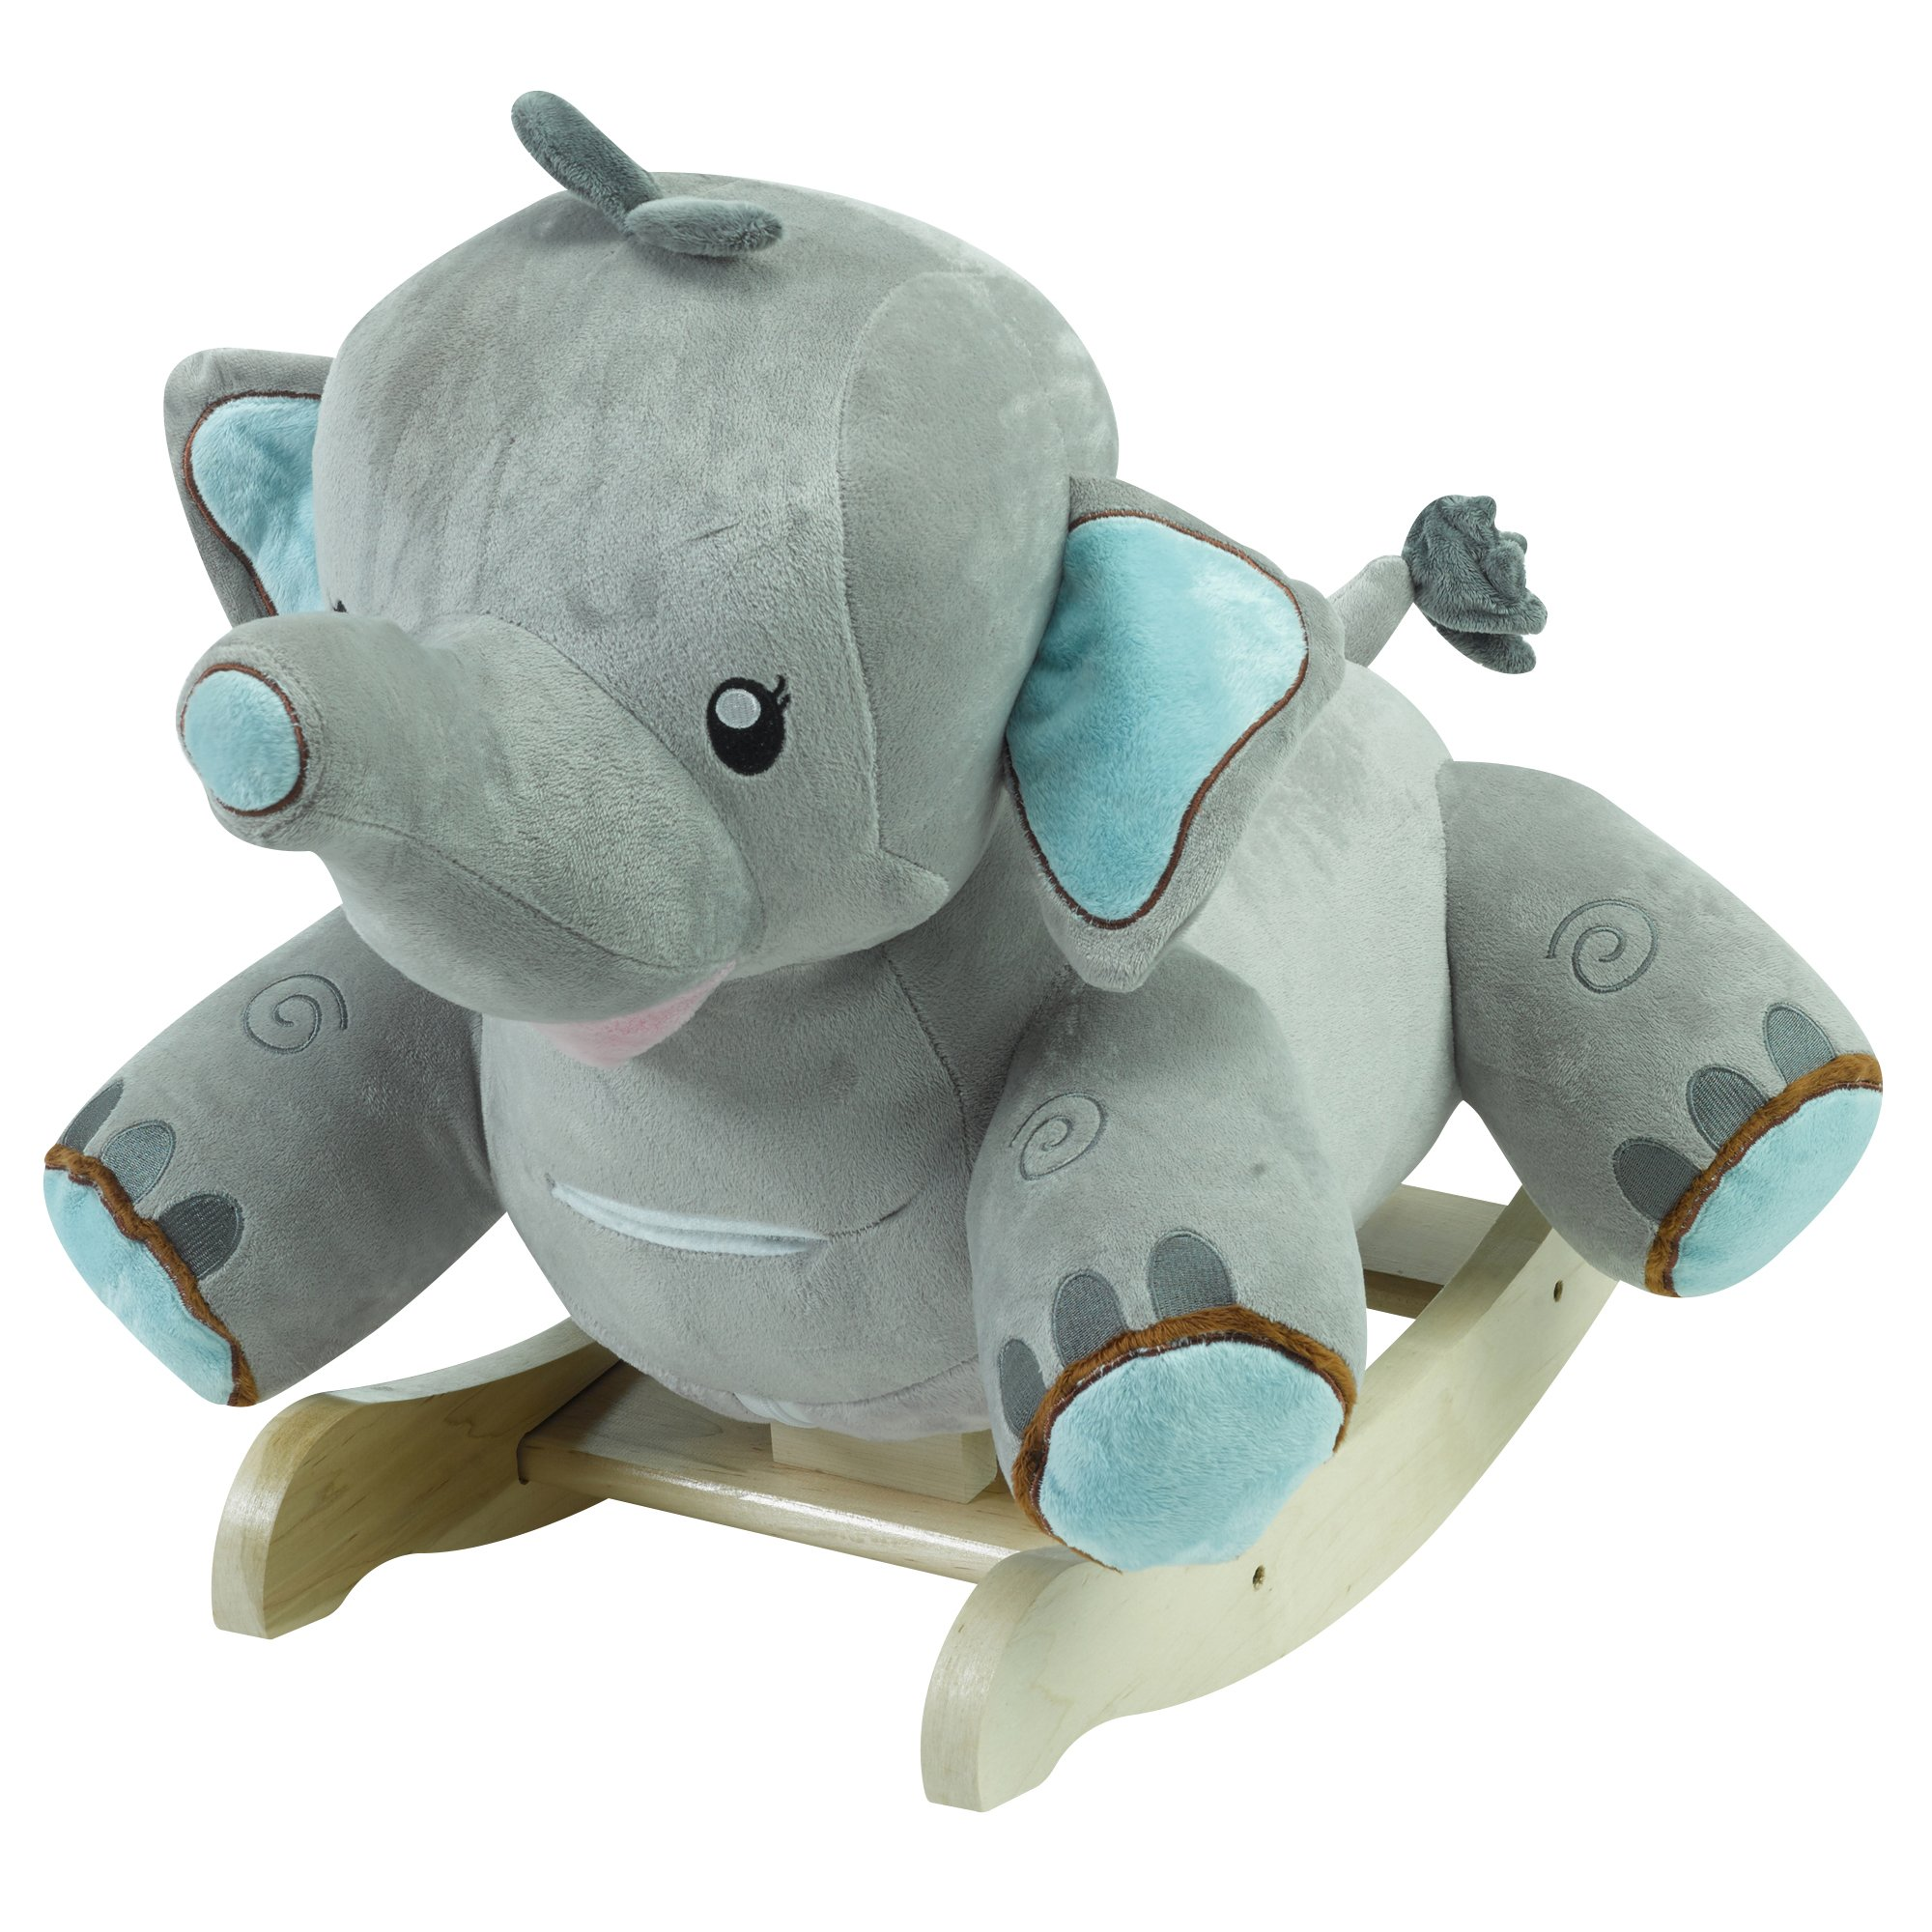 Rockabye Stomp The Elephant Ride On